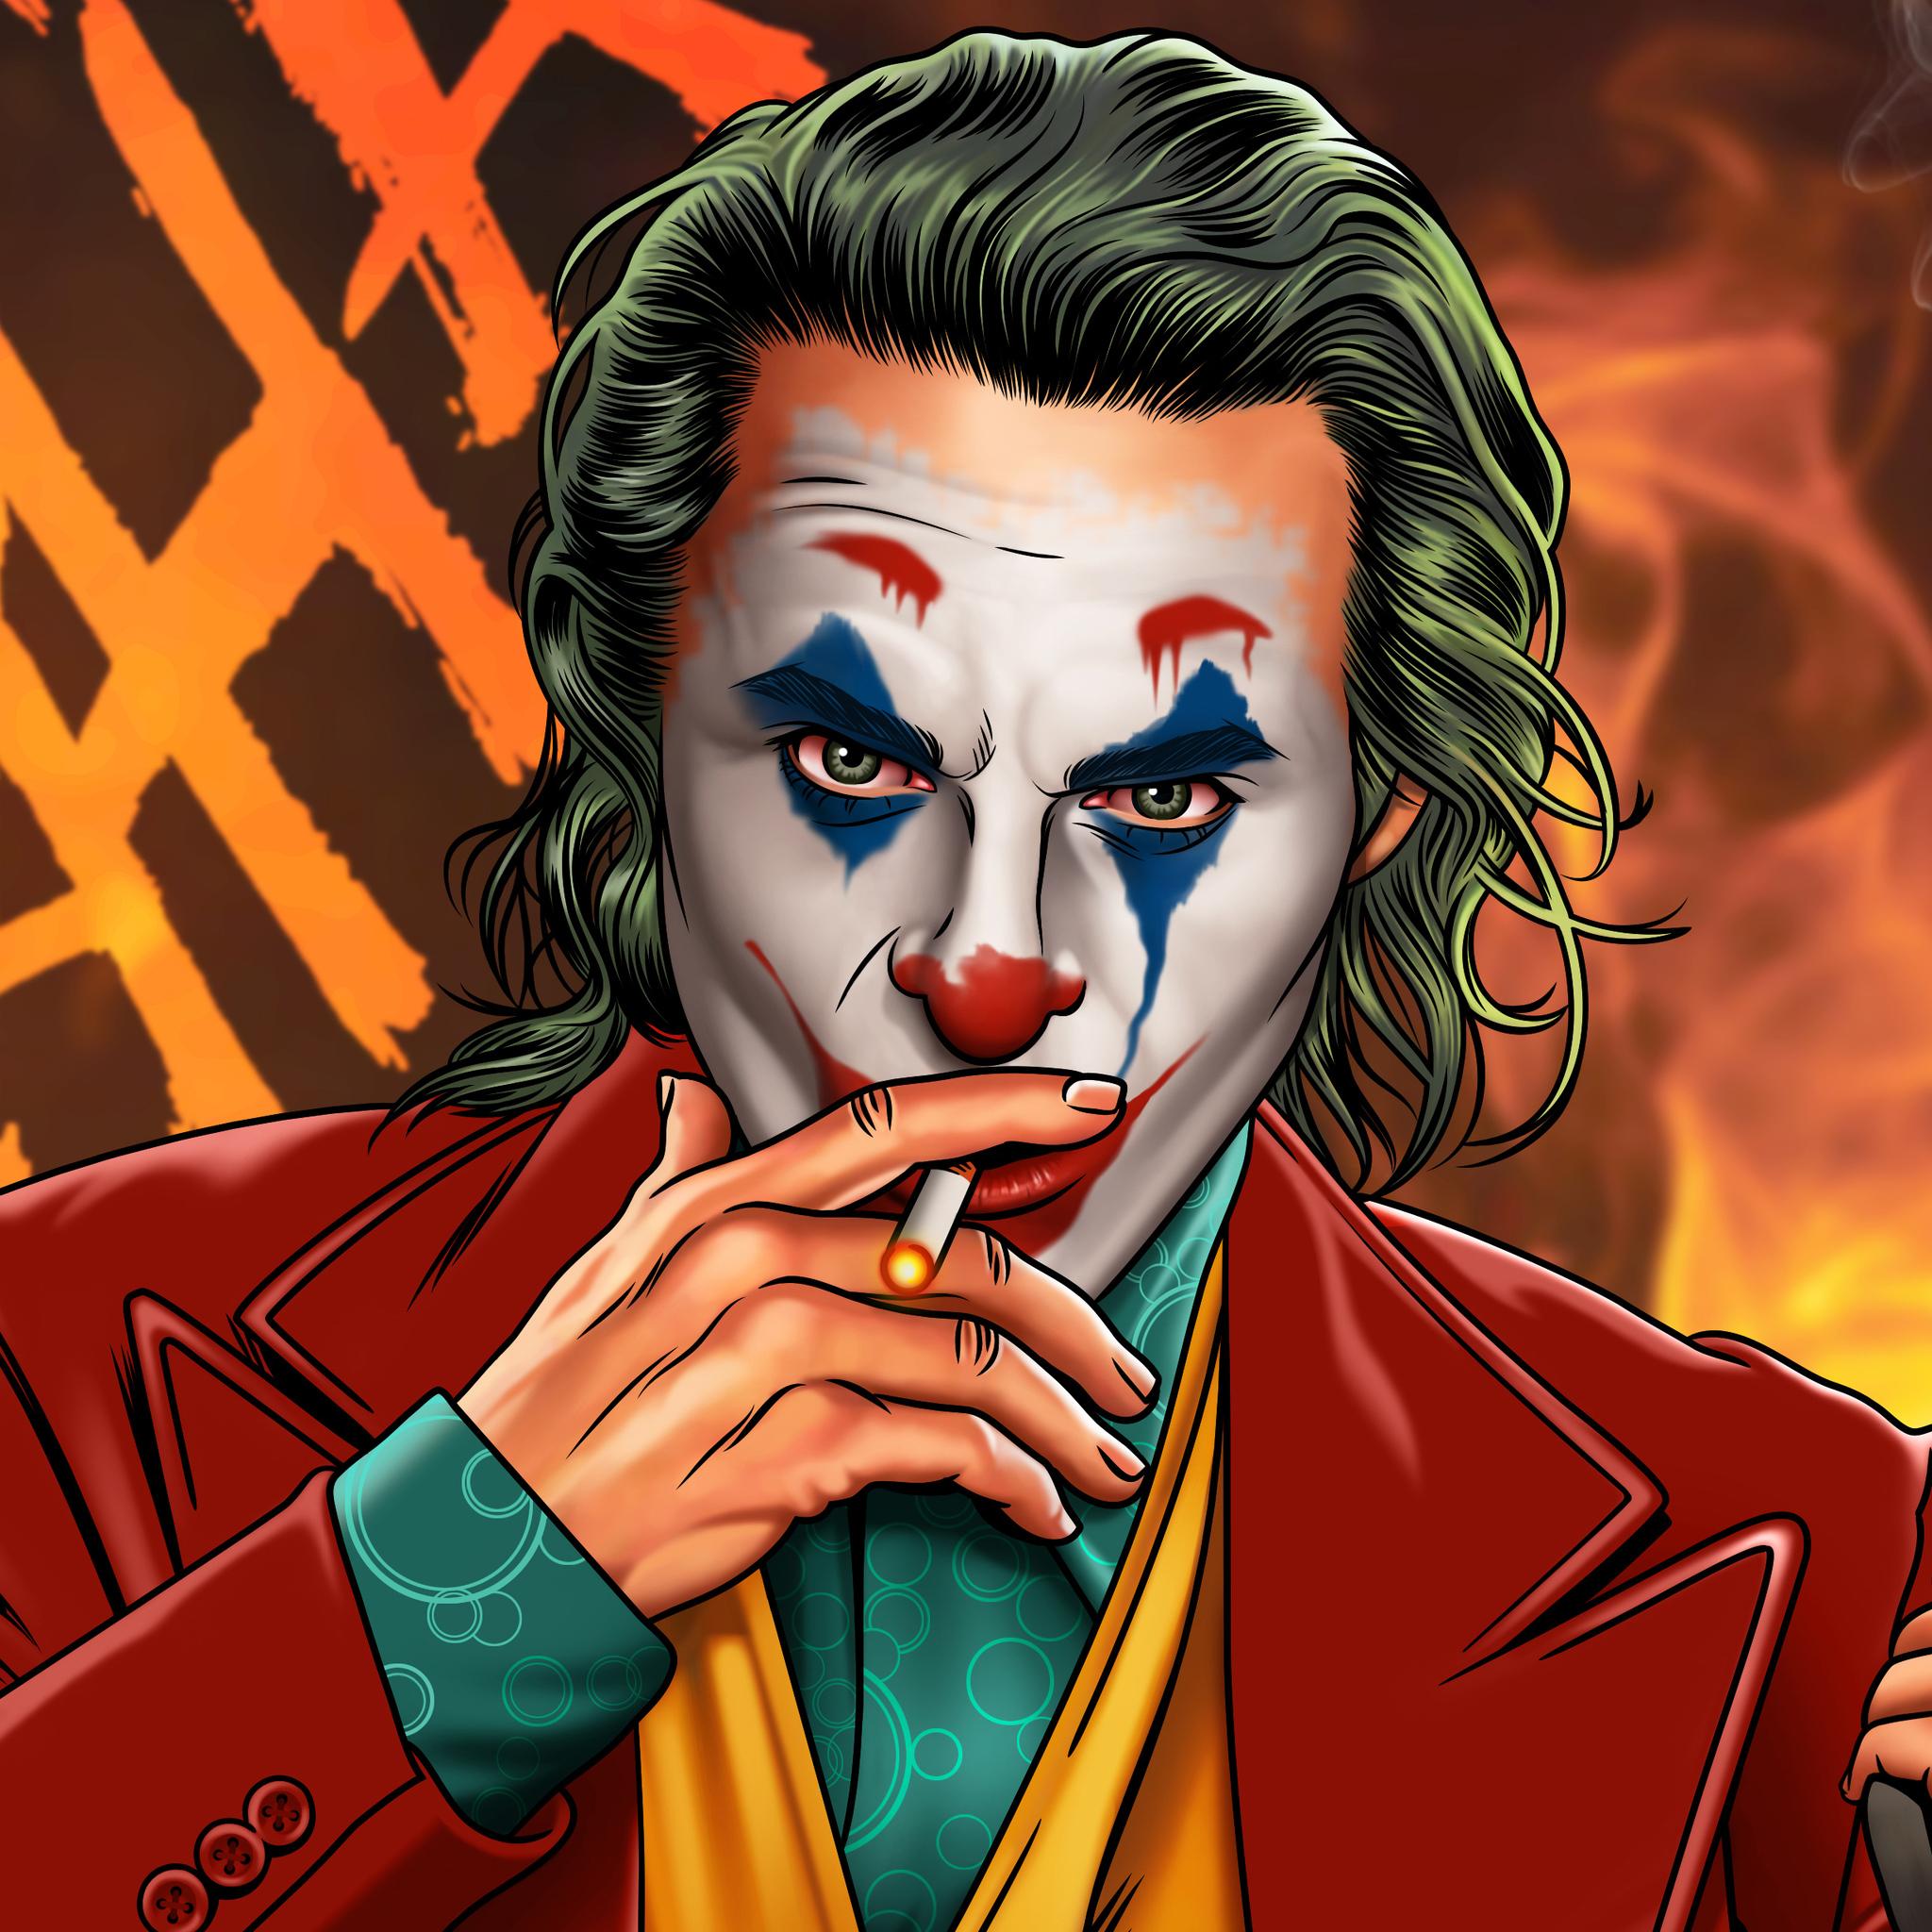 joker-smoker-gentlemen-4k-82.jpg